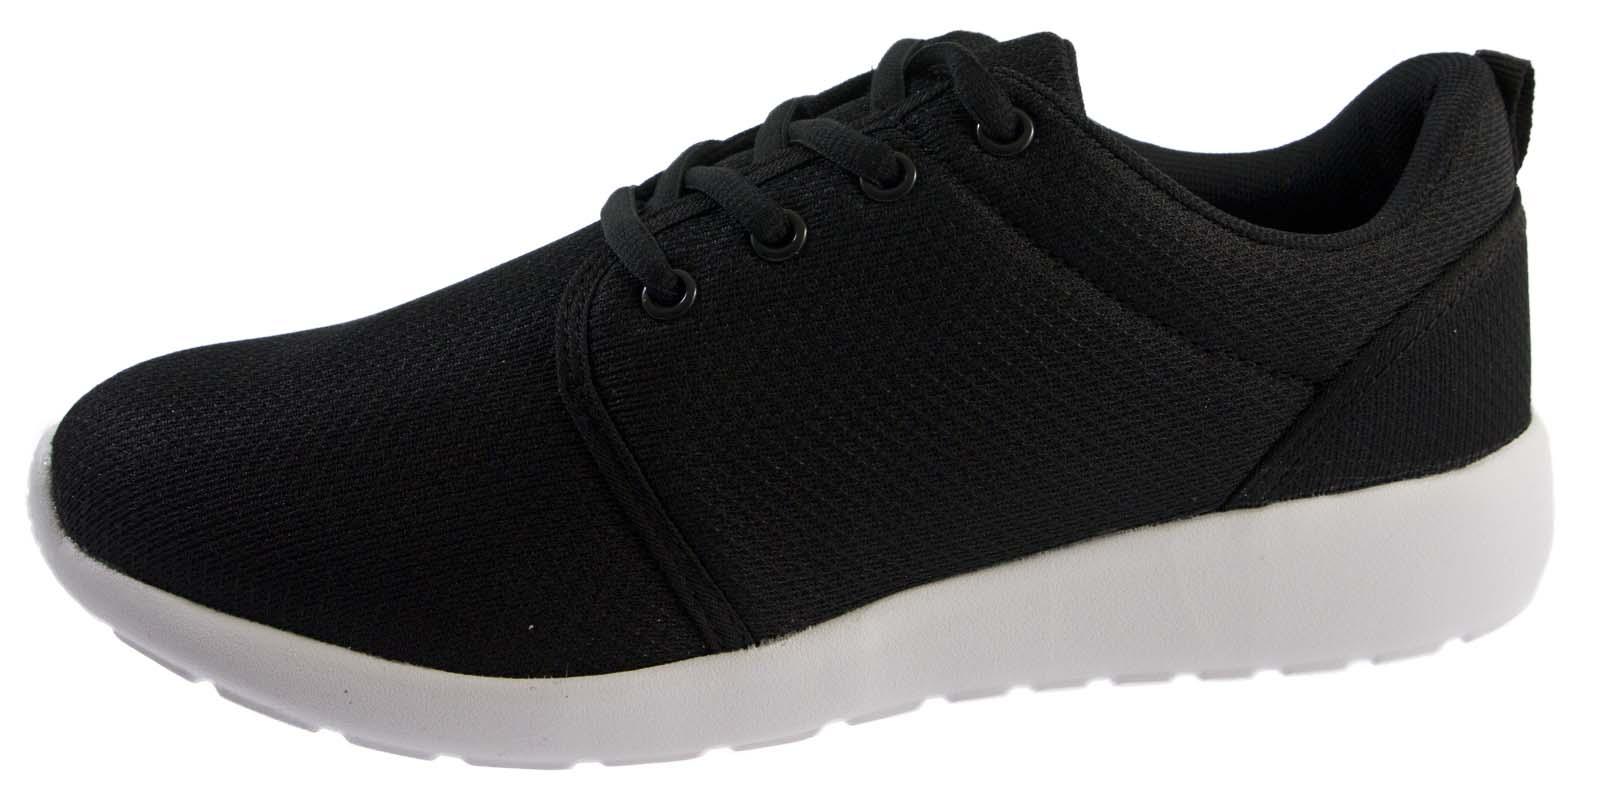 Para Mujer Chicas Ligero Deportes Entrenadores transpirables zapatos para correr con Encaje Talla de UPS